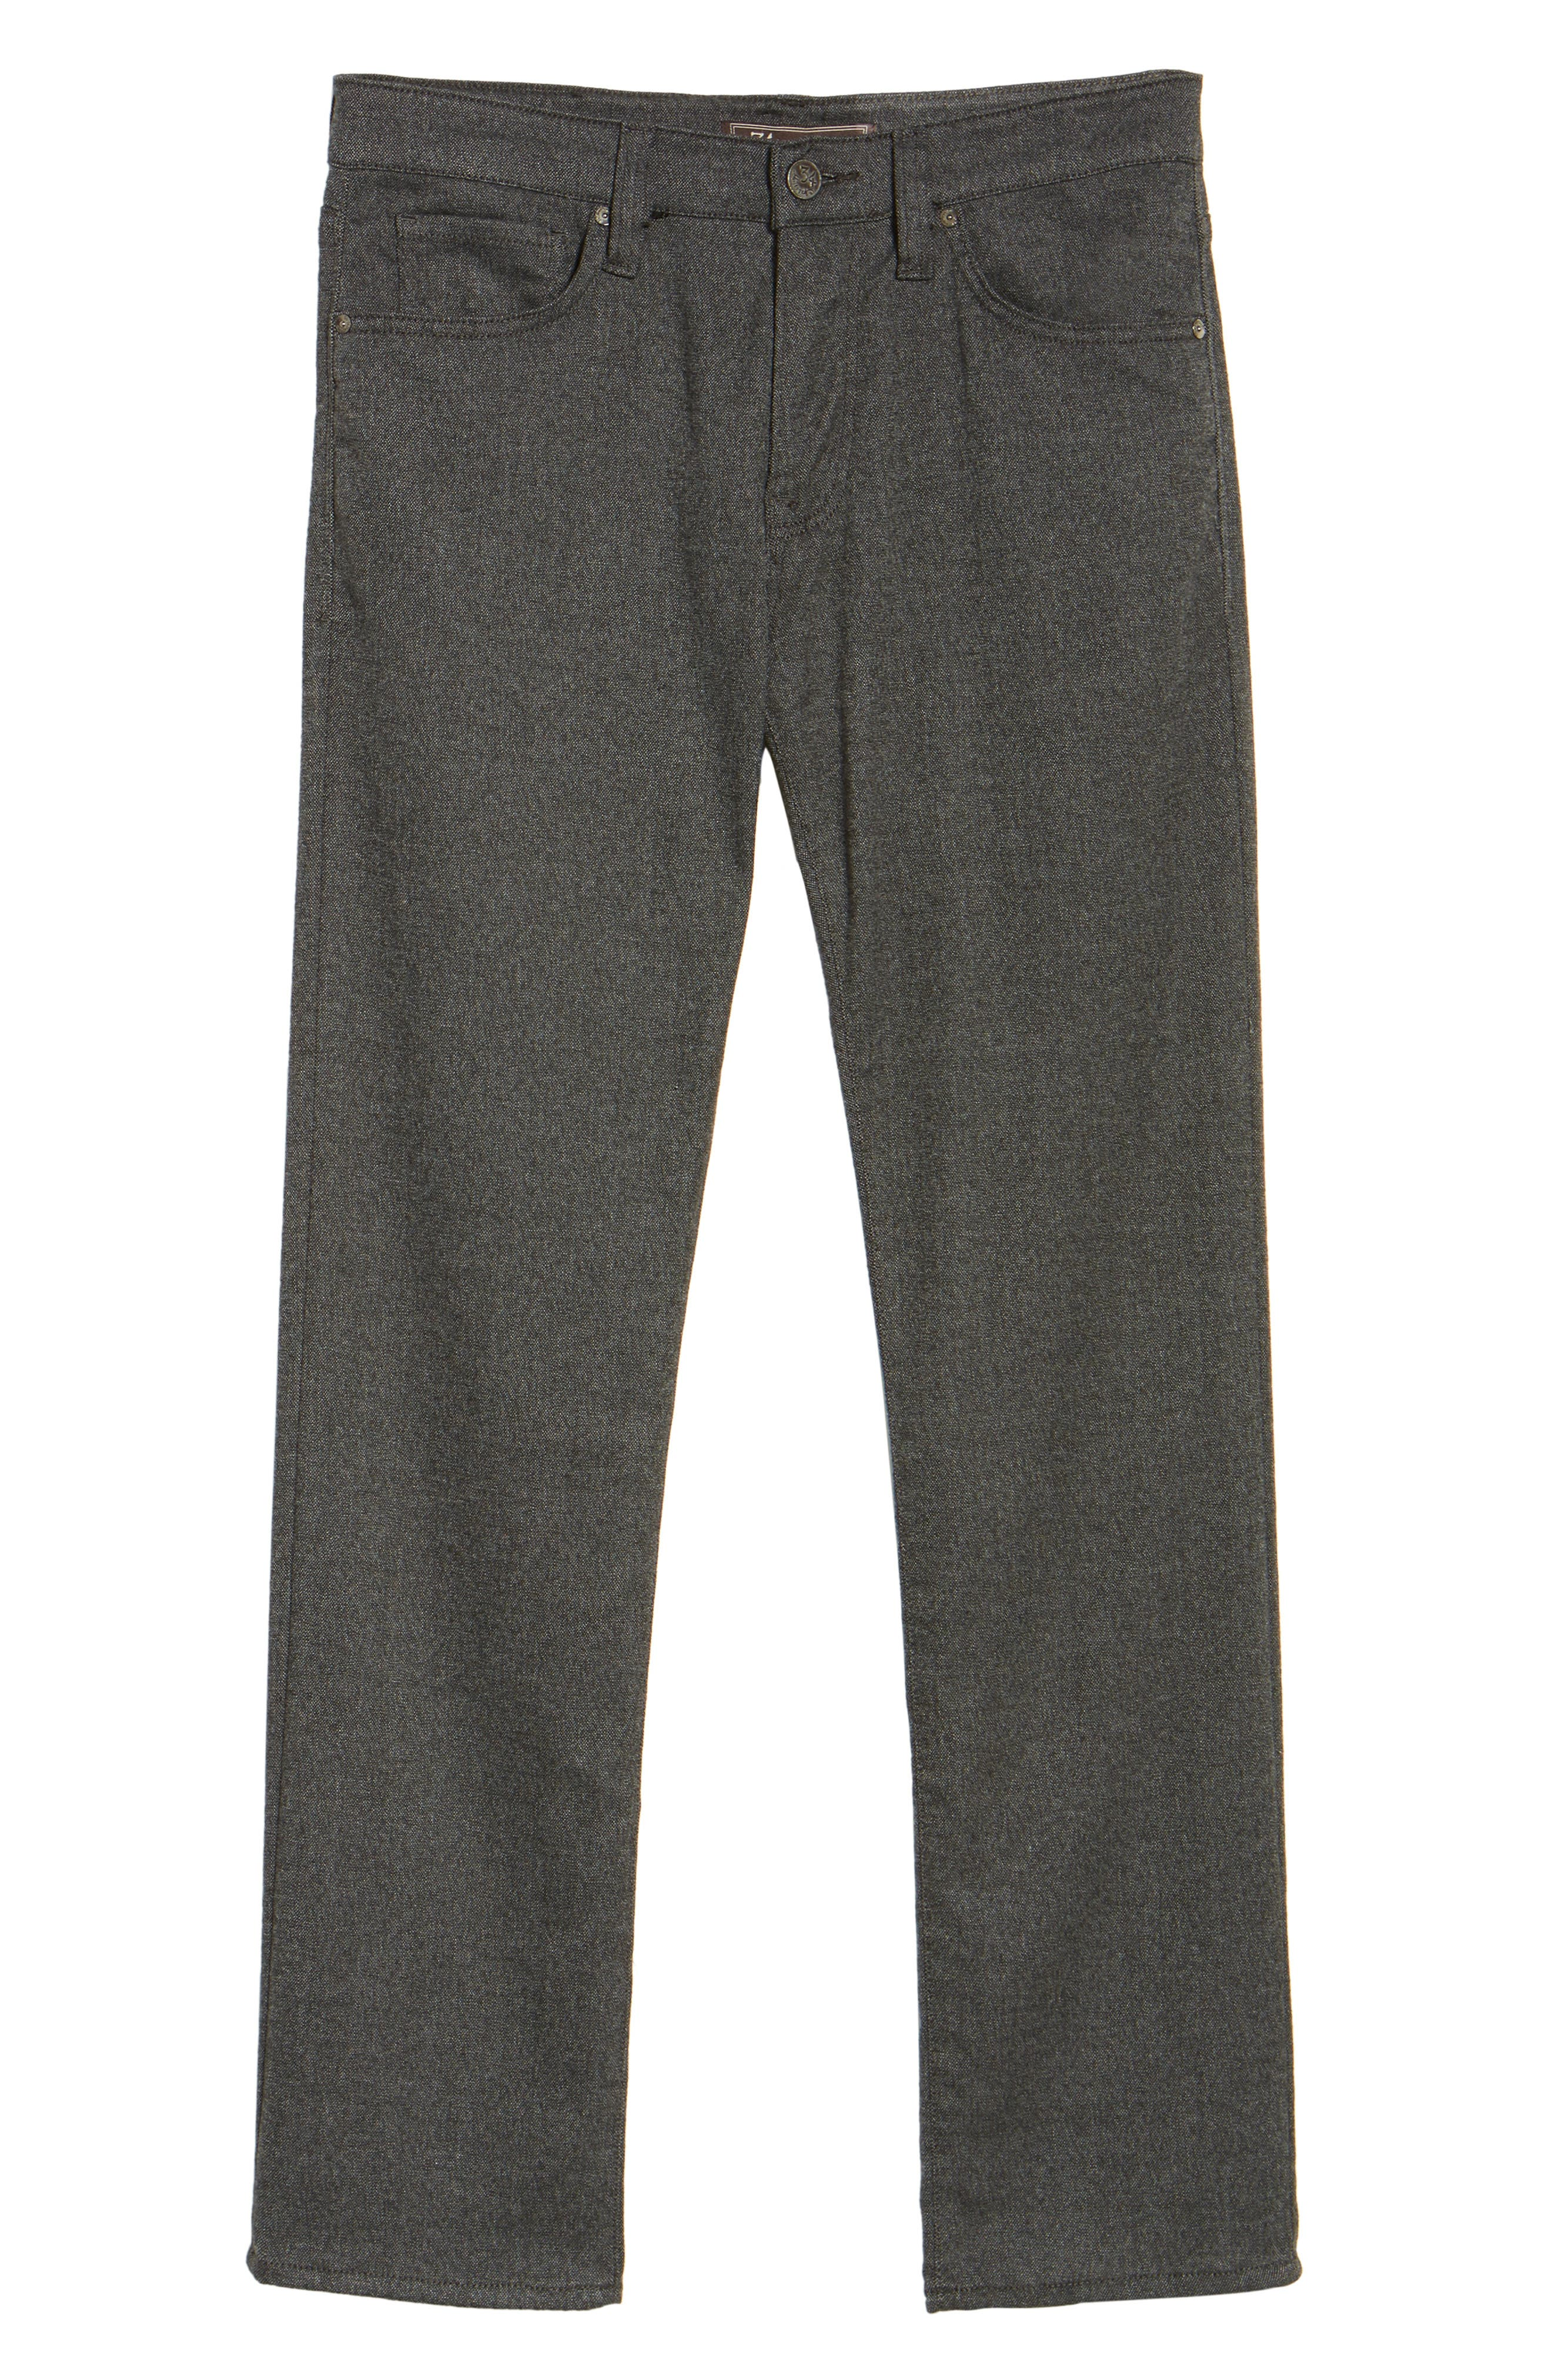 Courage Straight Leg Tweed Pants,                             Alternate thumbnail 6, color,                             020